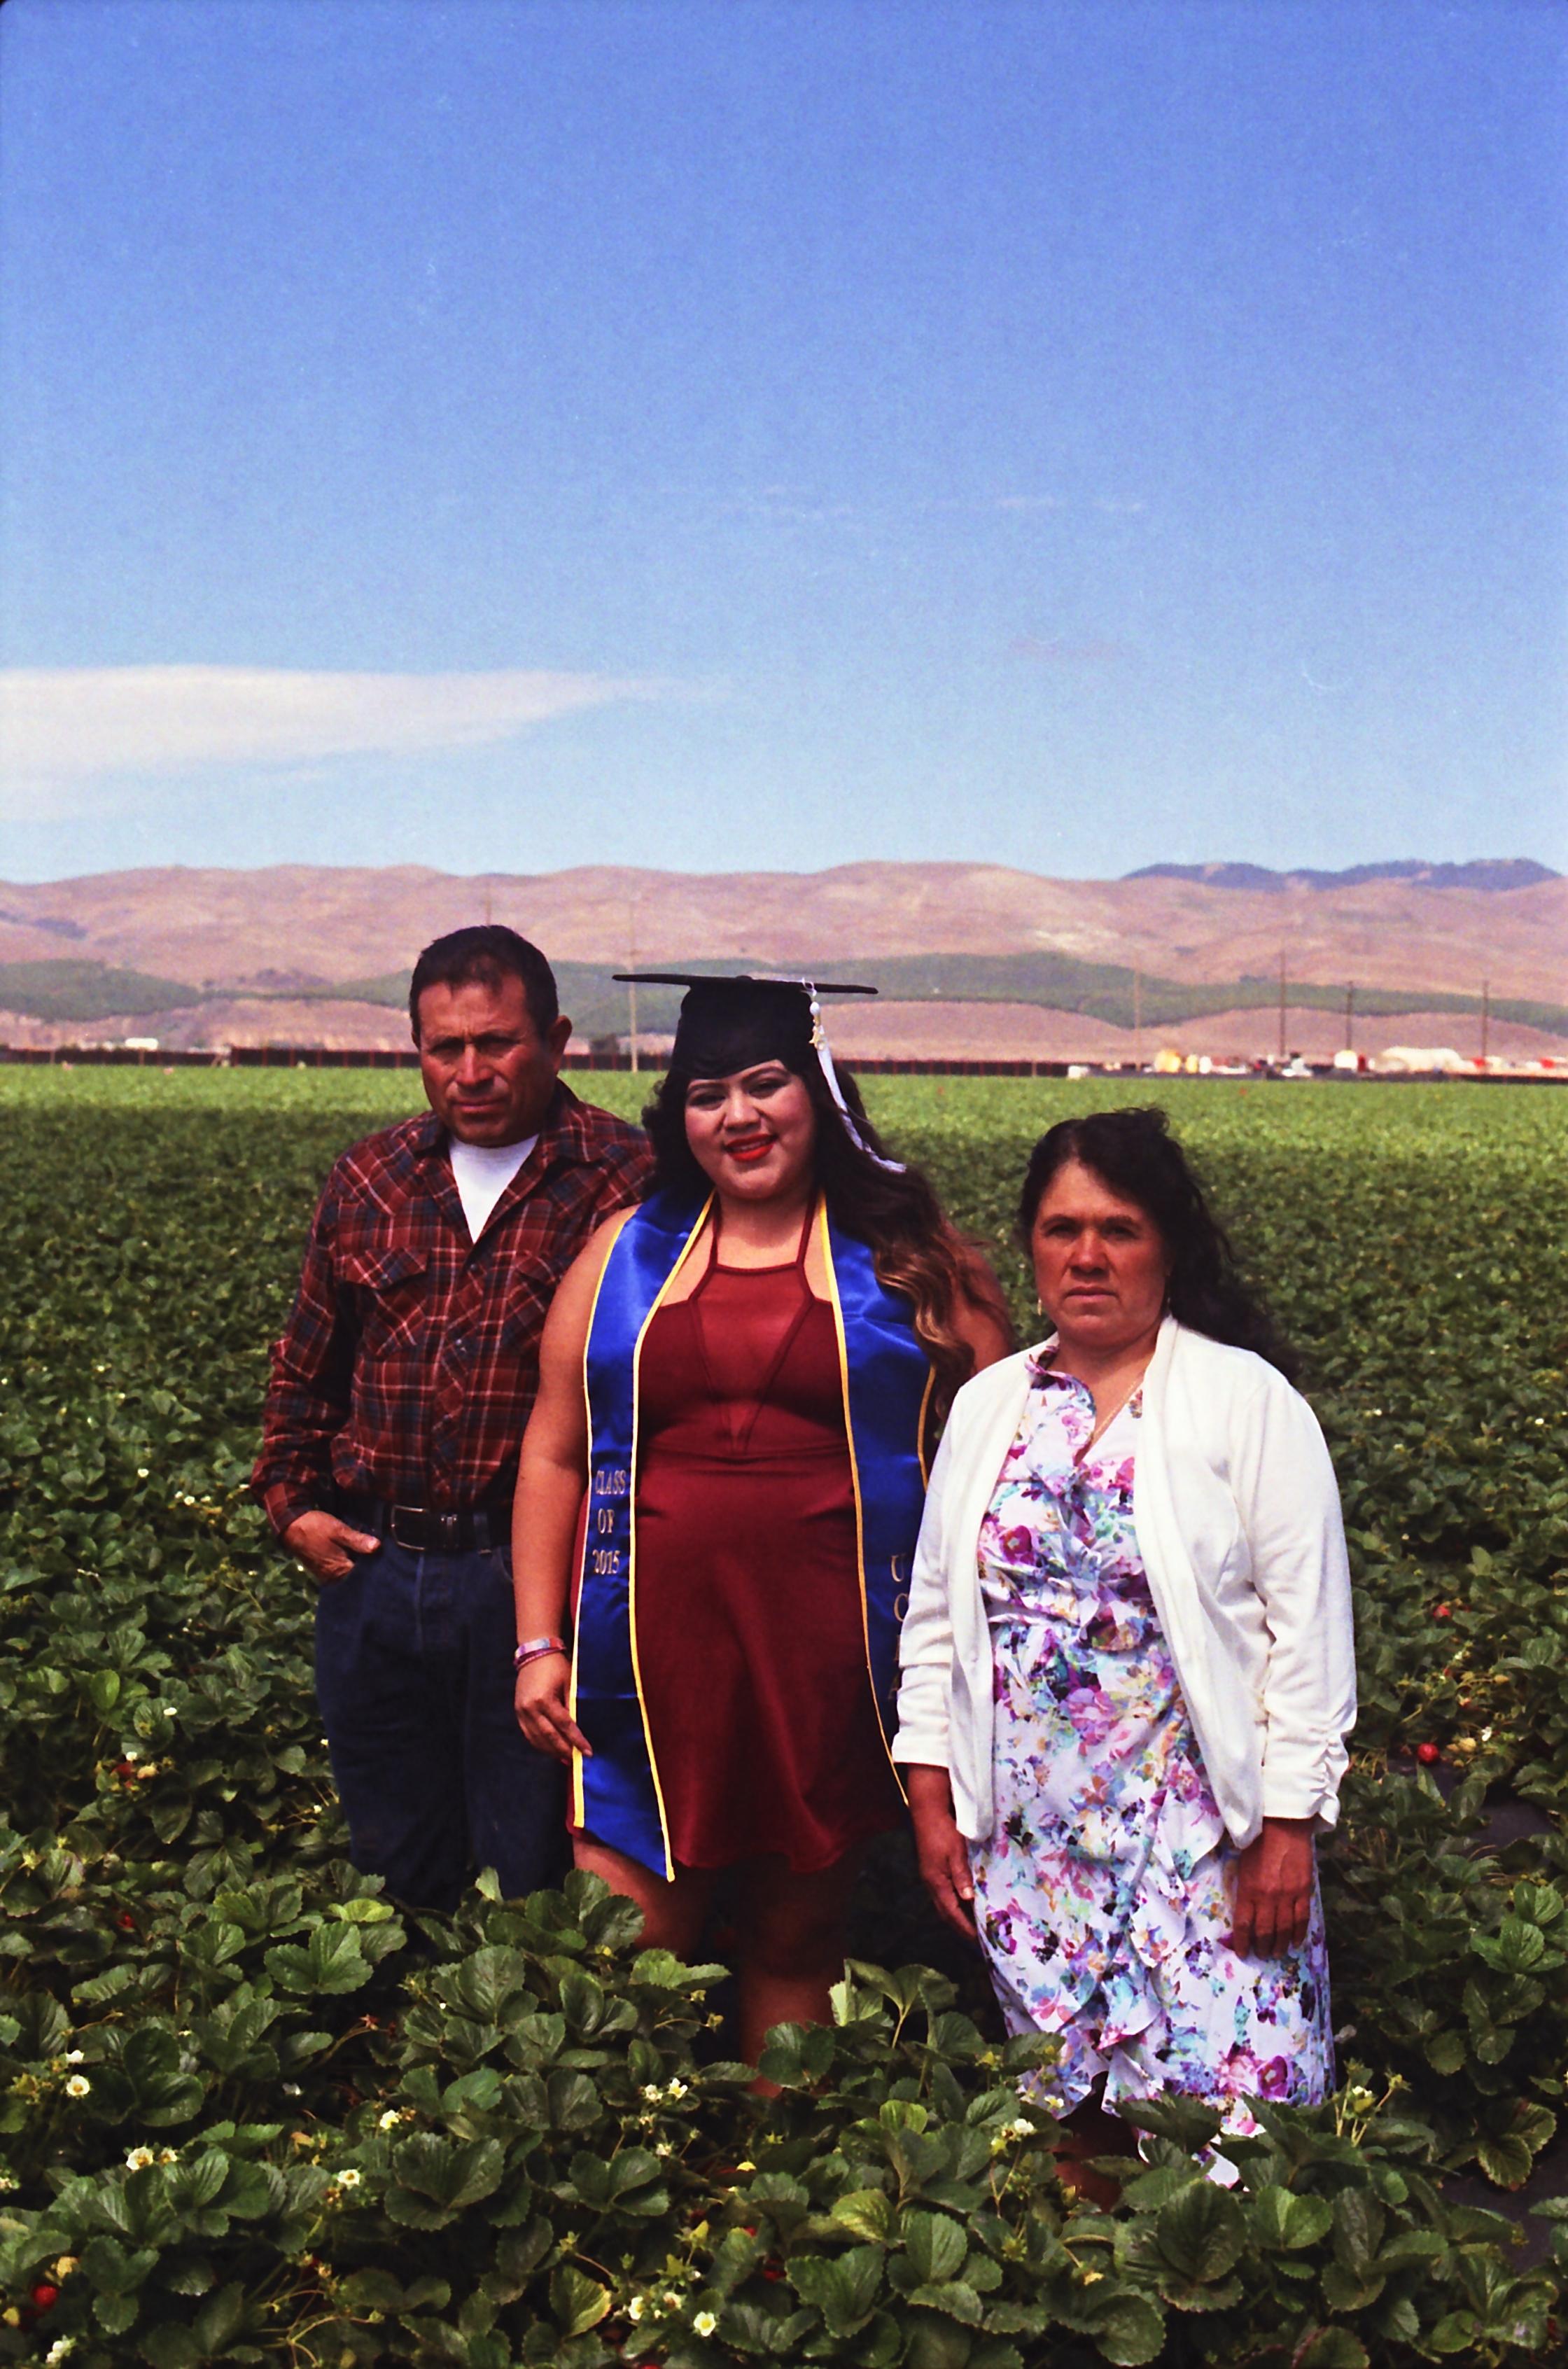 Gonzales Family 2015-Photo Credit: @eljorgeflores